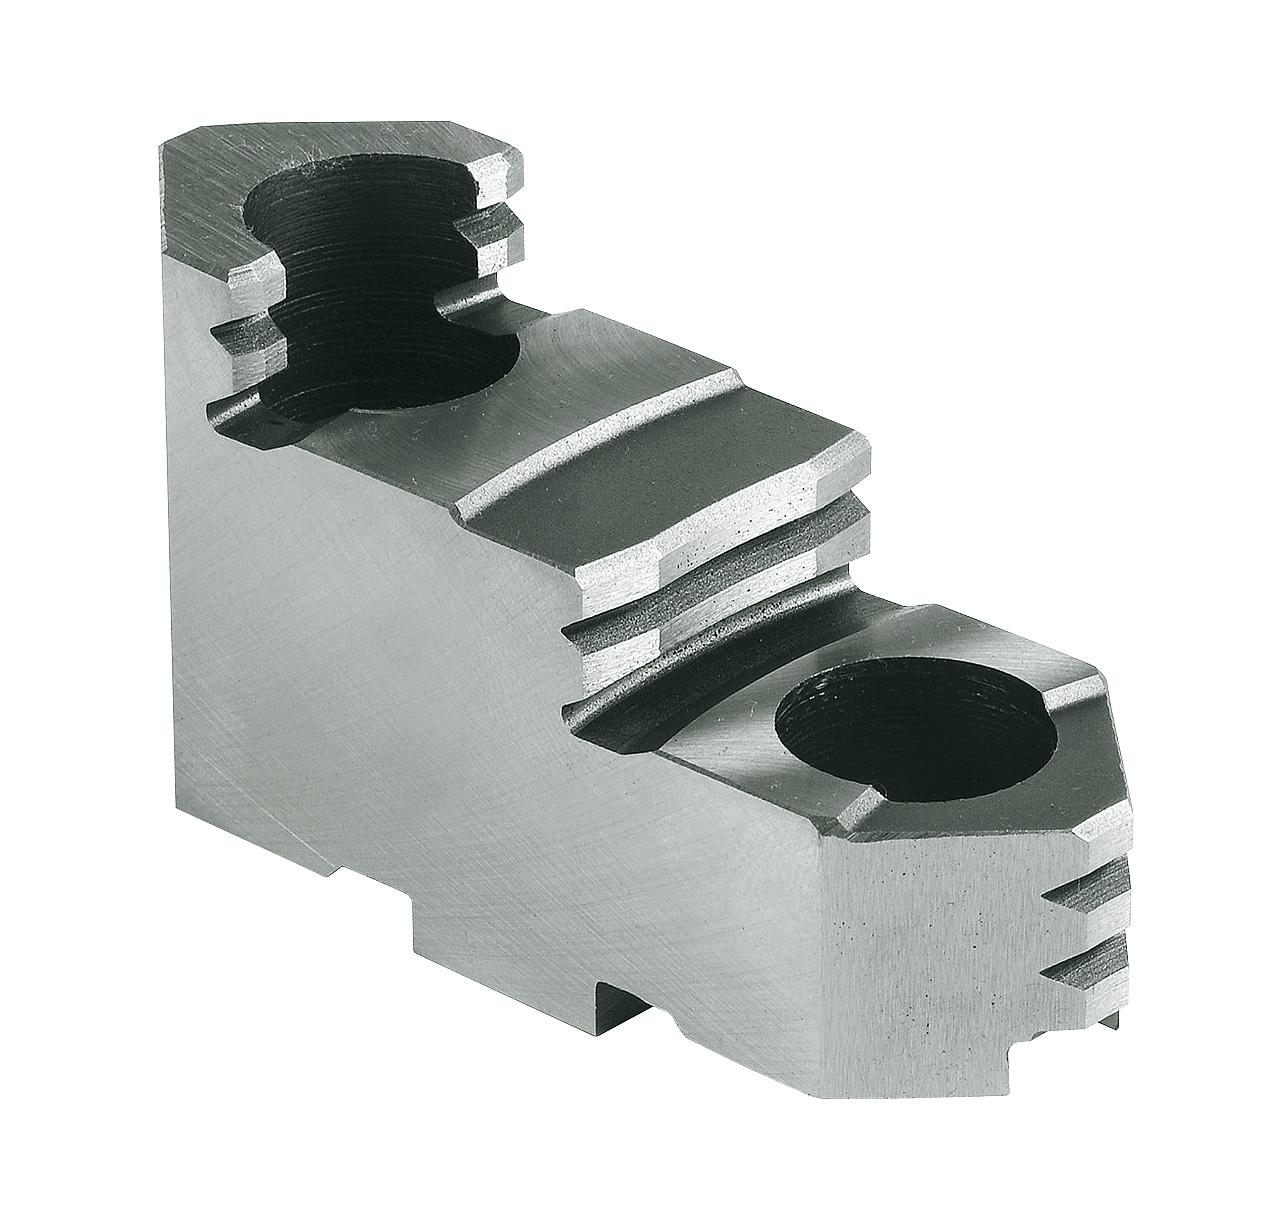 Szczęki górne twarde - komplet DTJ-DK11-630 BERNARDO